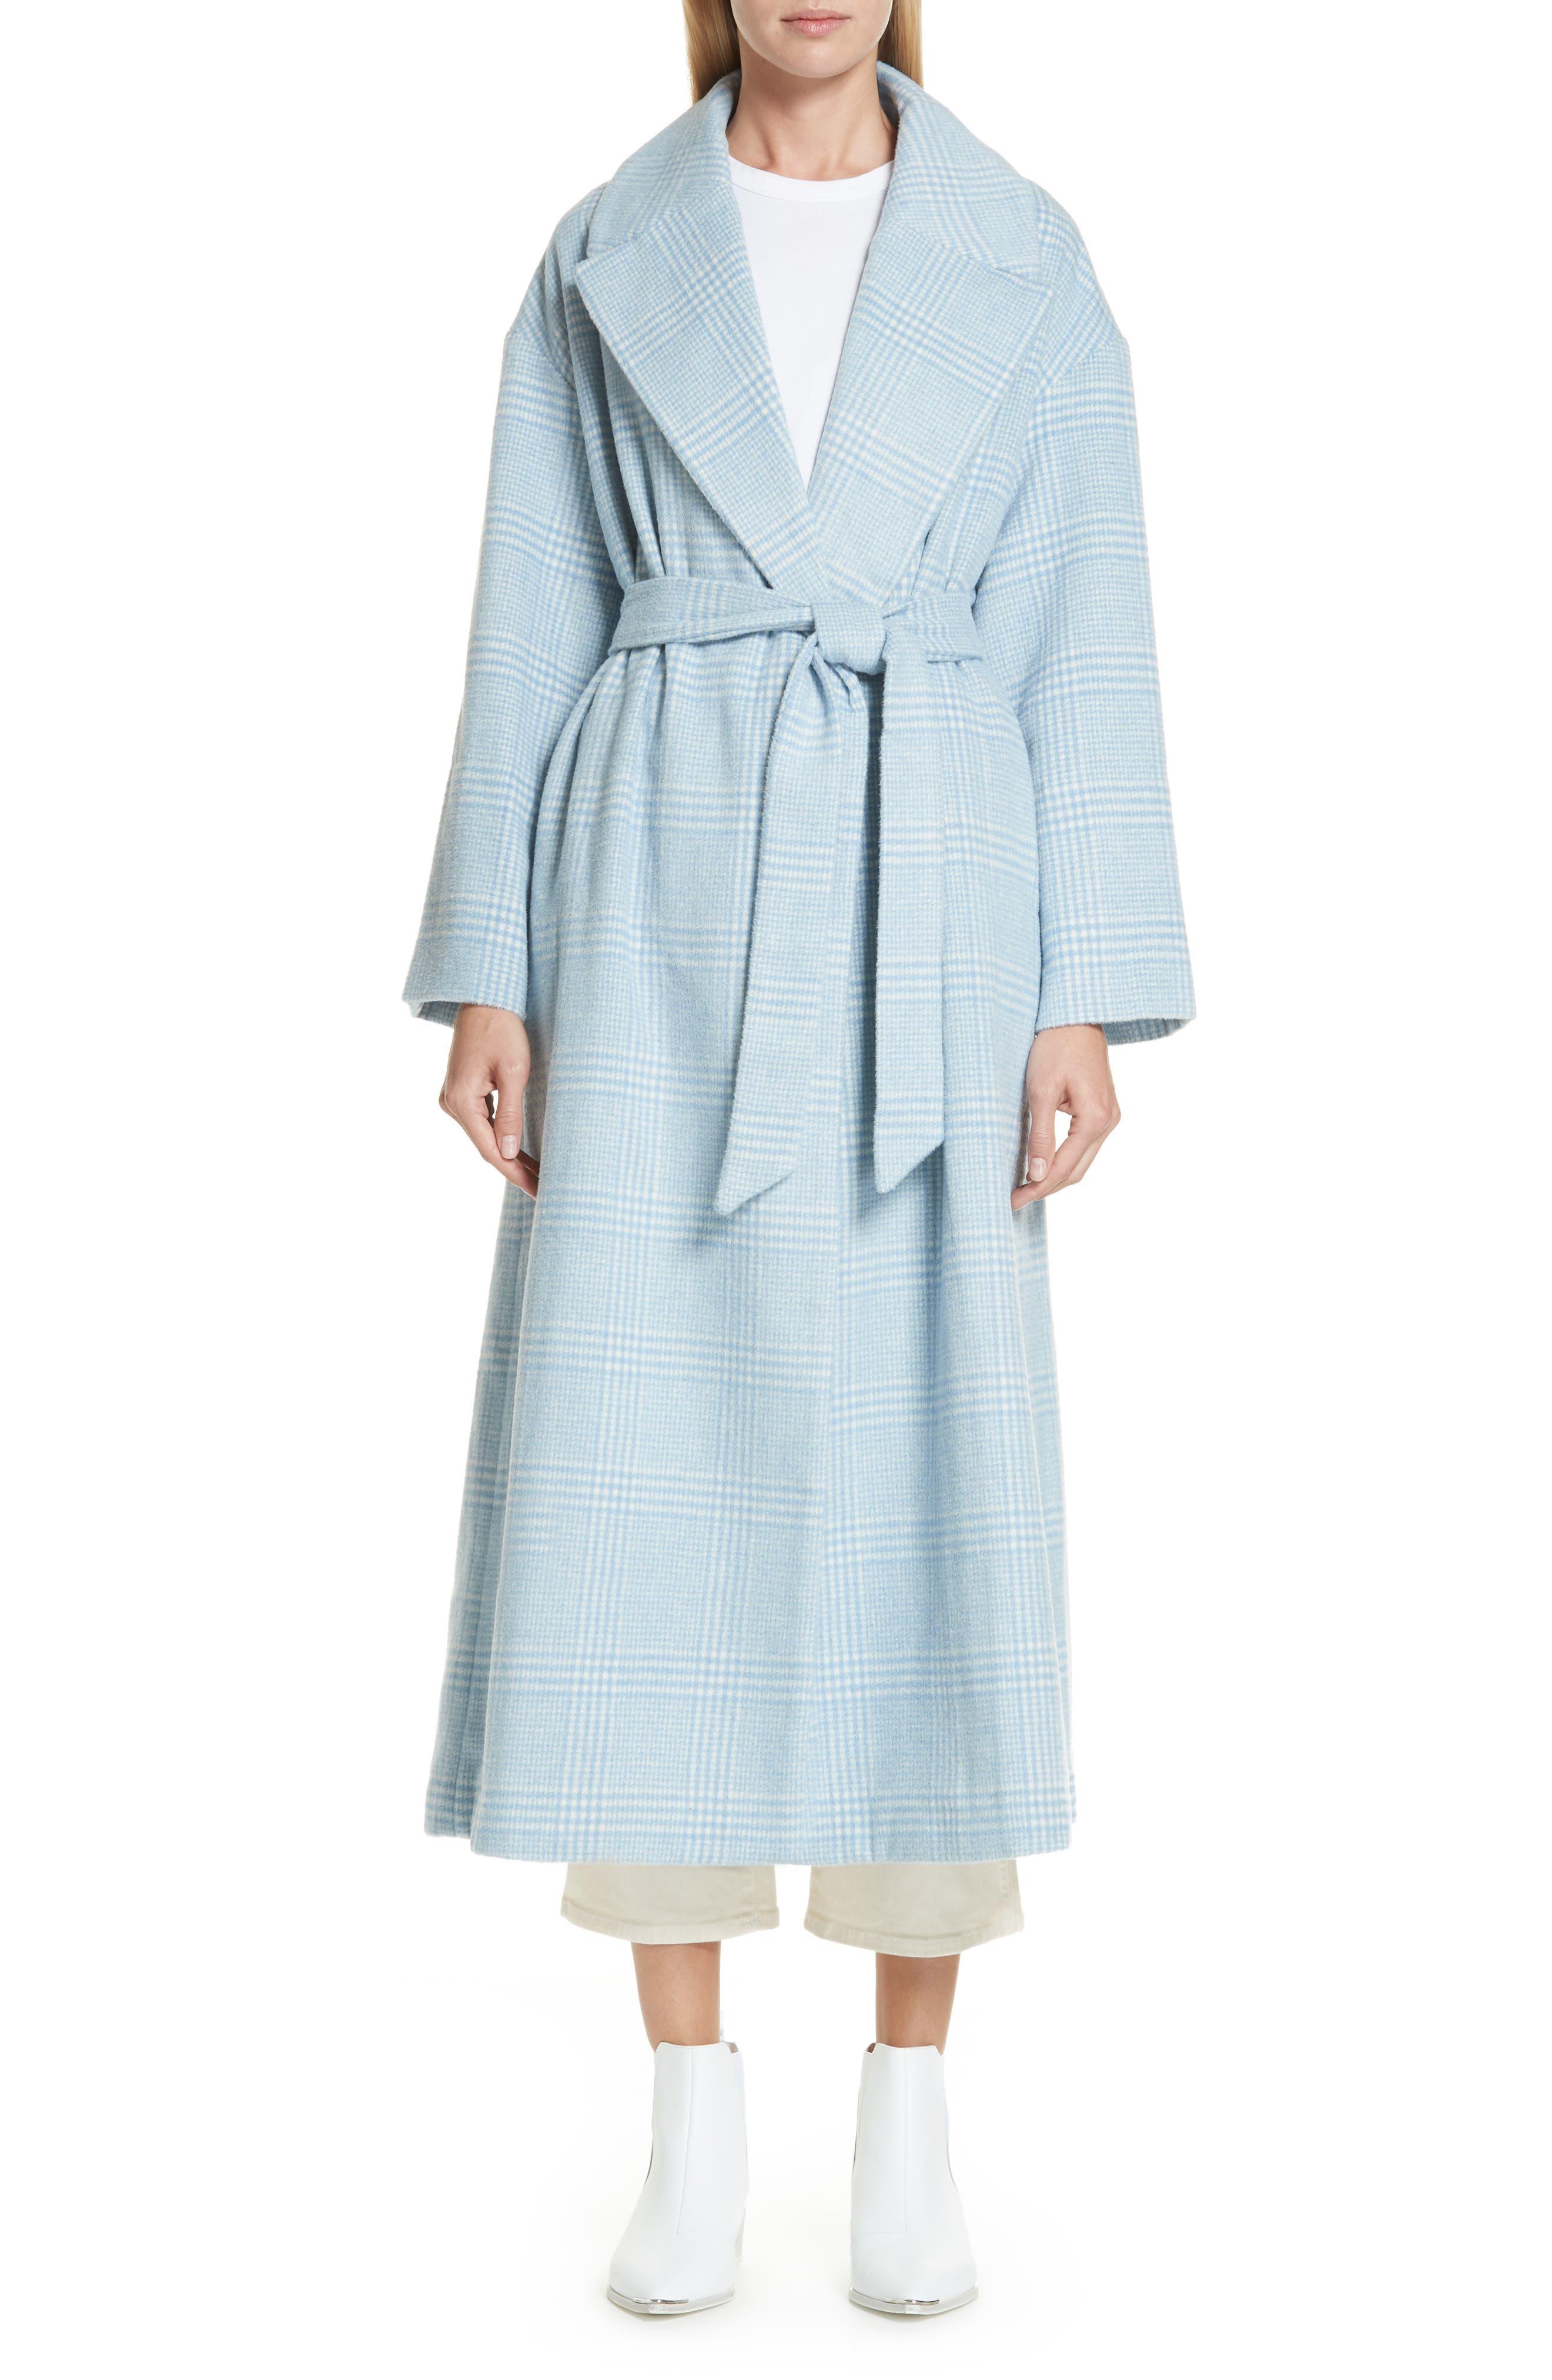 Woodside Coat,                         Main,                         color, SERENITY BLUE